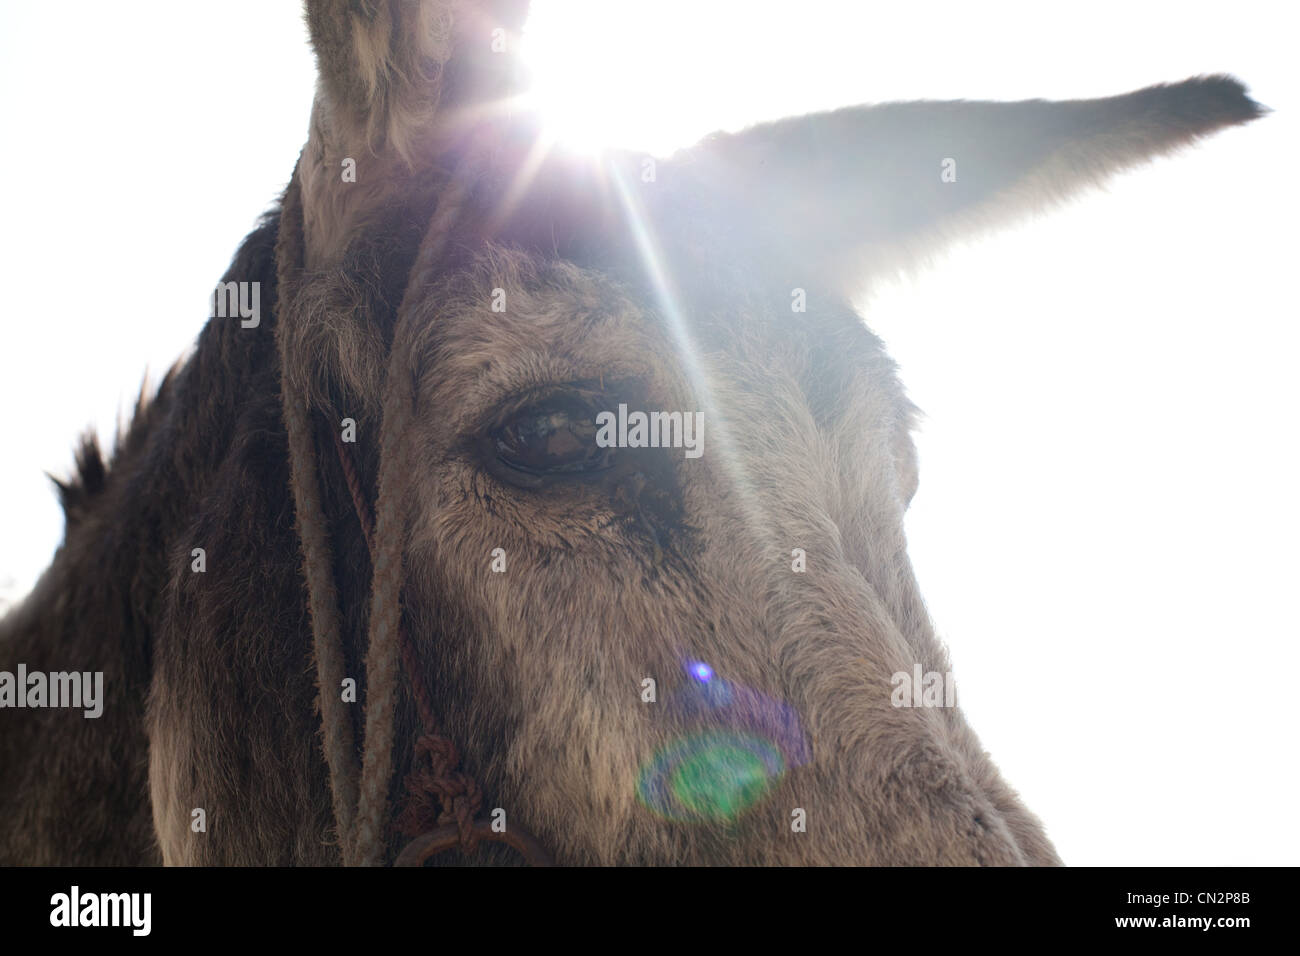 Testa d'asino era, close up Immagini Stock